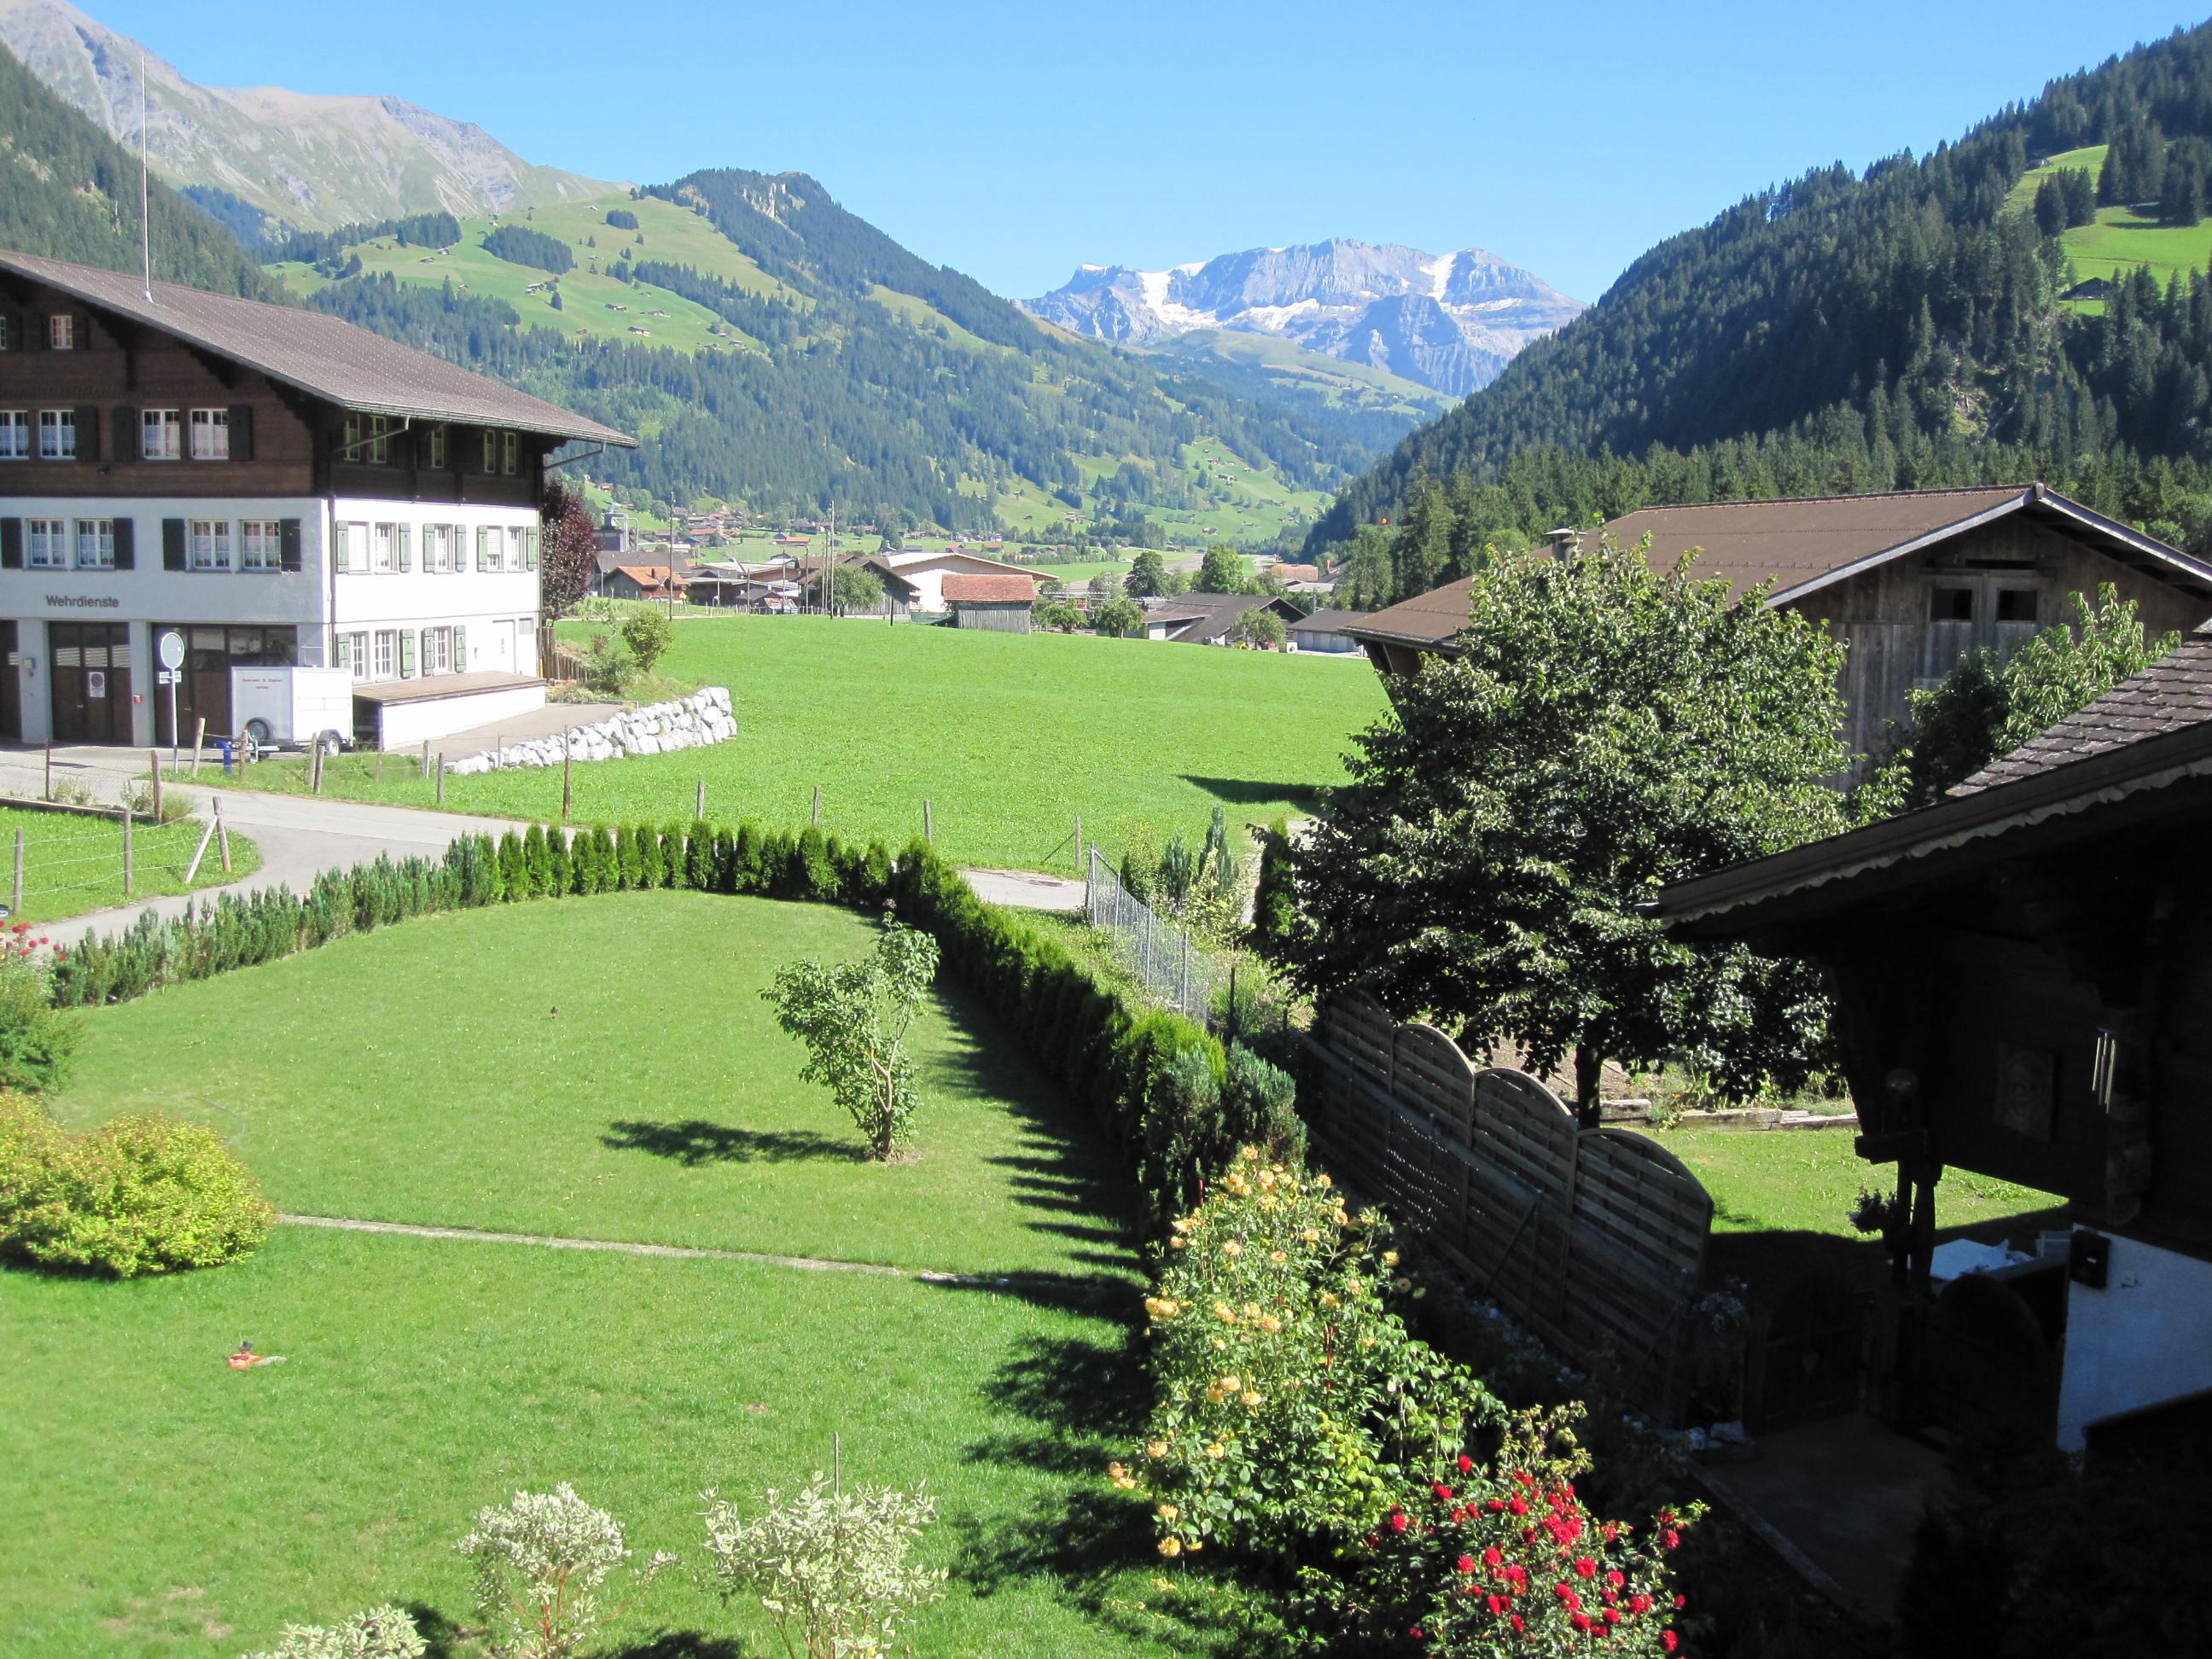 Chalet-Hotel Alpenblick Wildstrubel 2